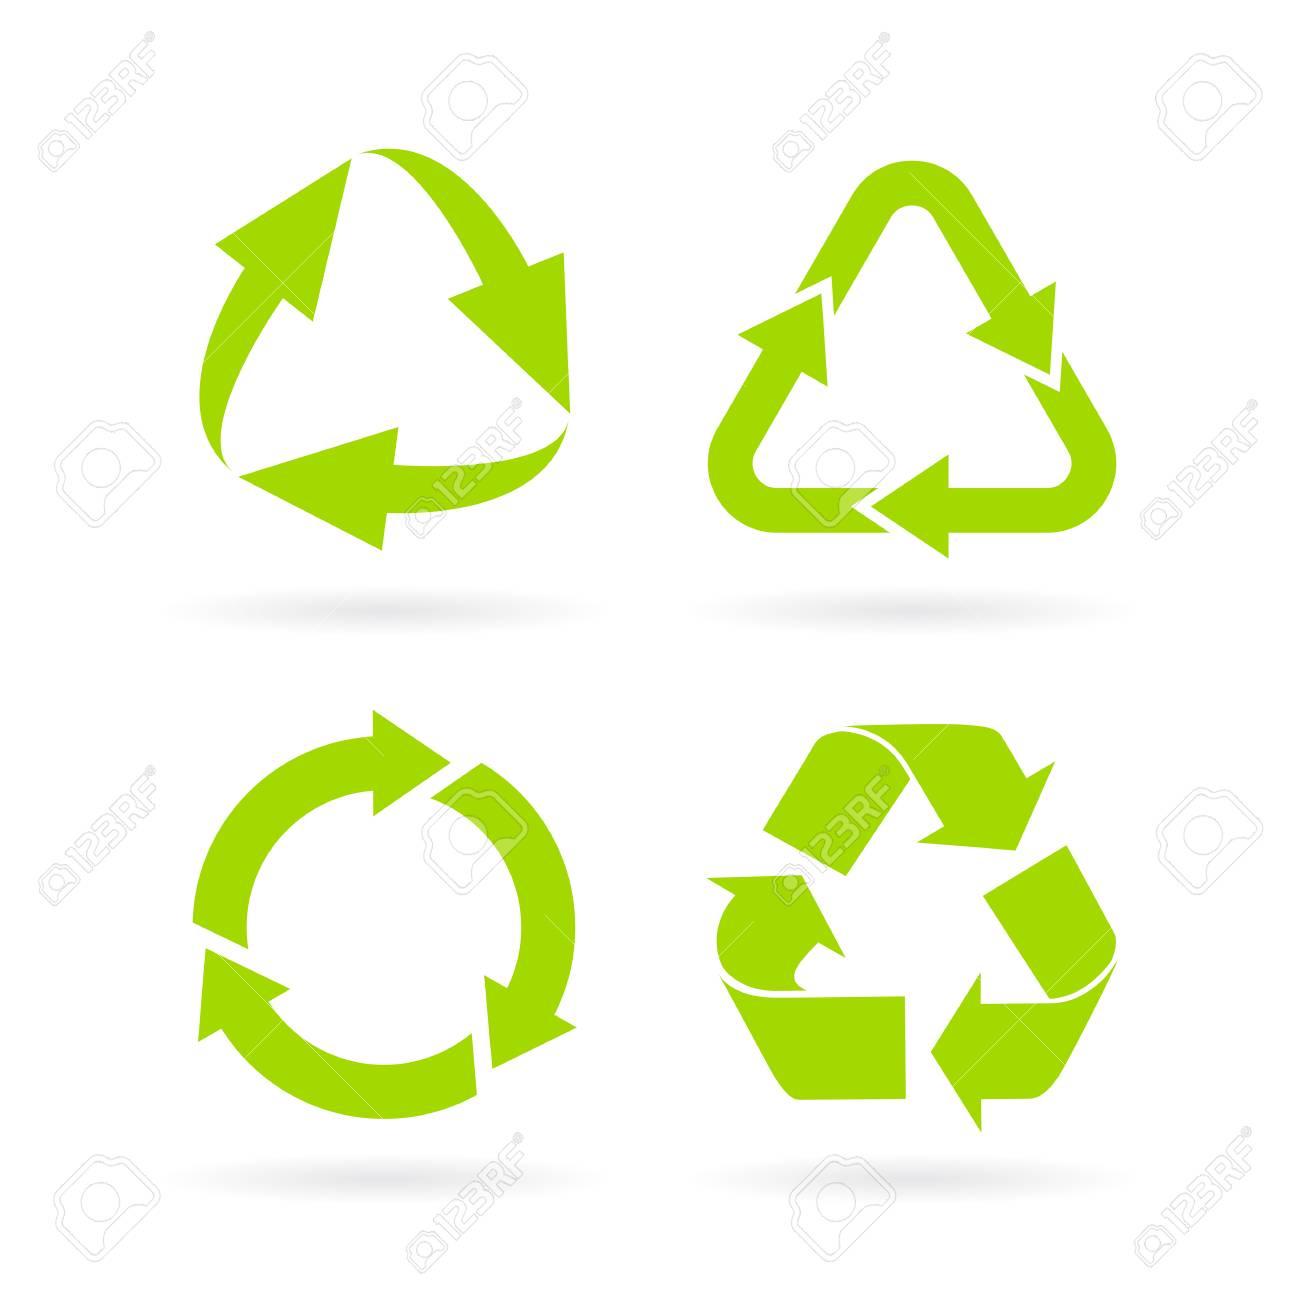 Eco green recycled symbol set royalty free cliparts vectors and eco green recycled symbol set stock vector 71050555 biocorpaavc